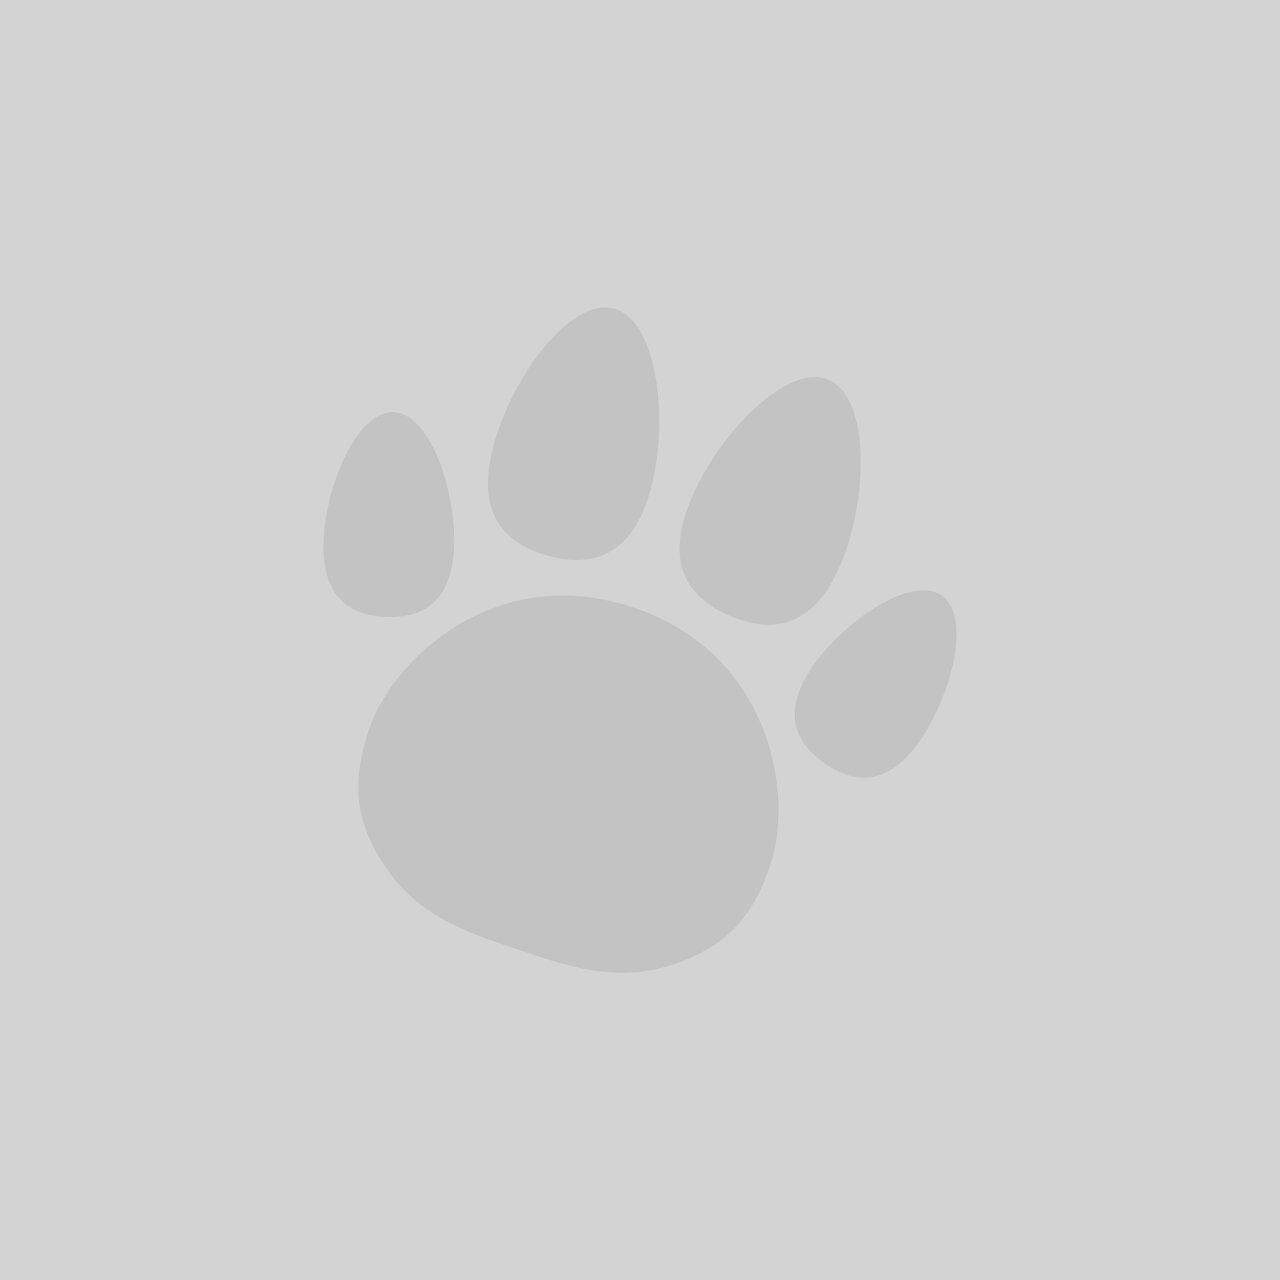 Kong Paste Puppy